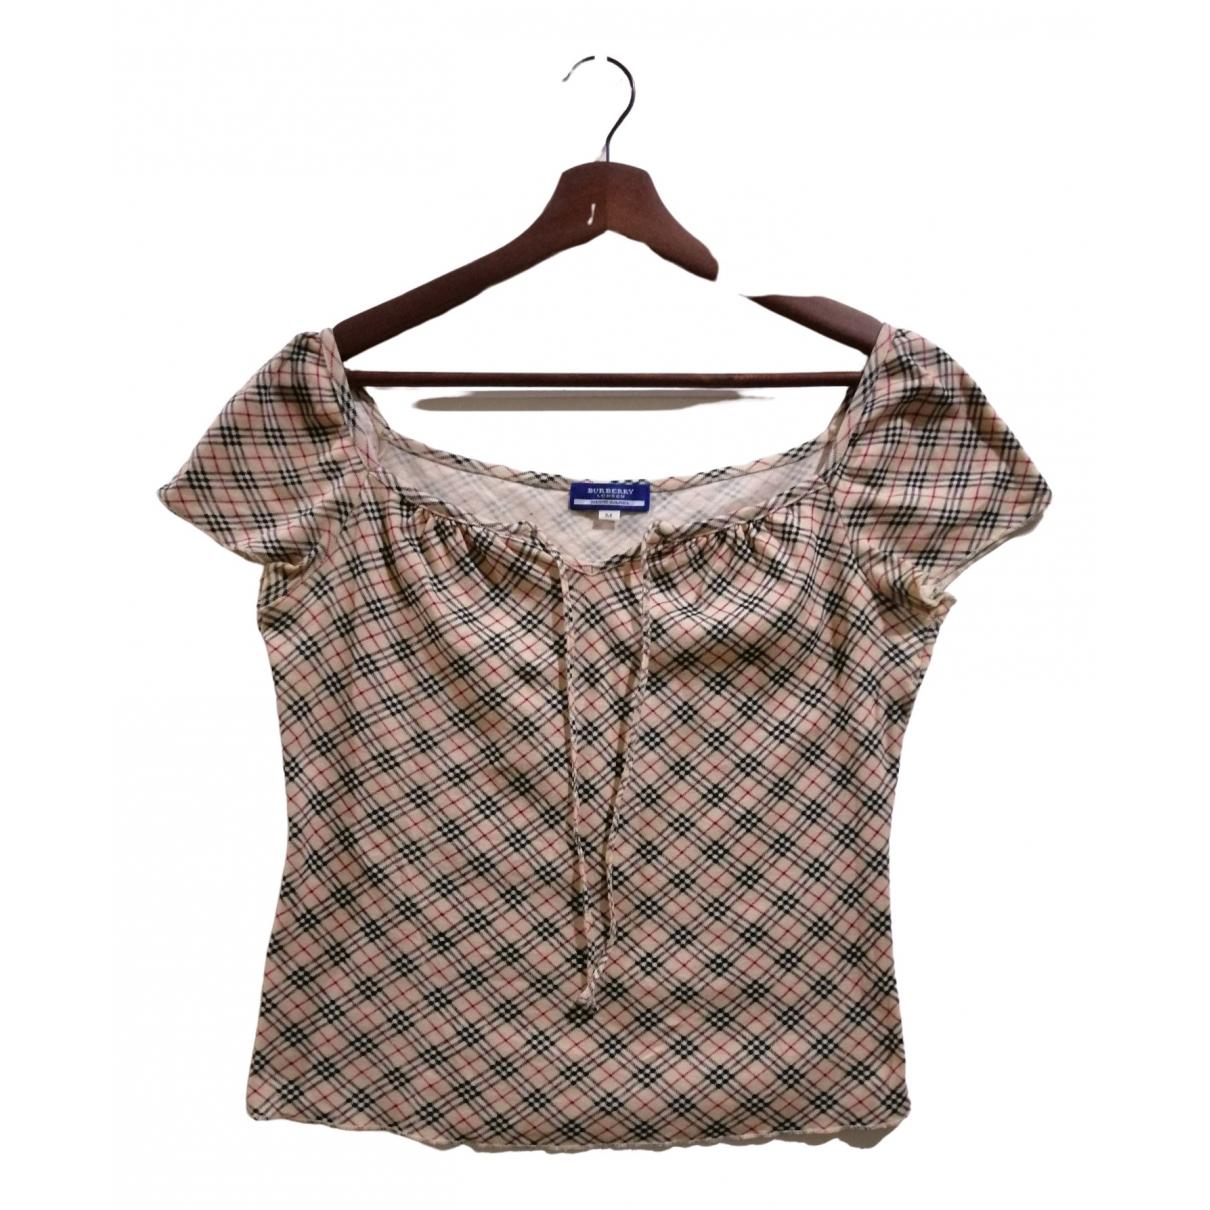 Burberry \N Beige Cotton  top for Women M International